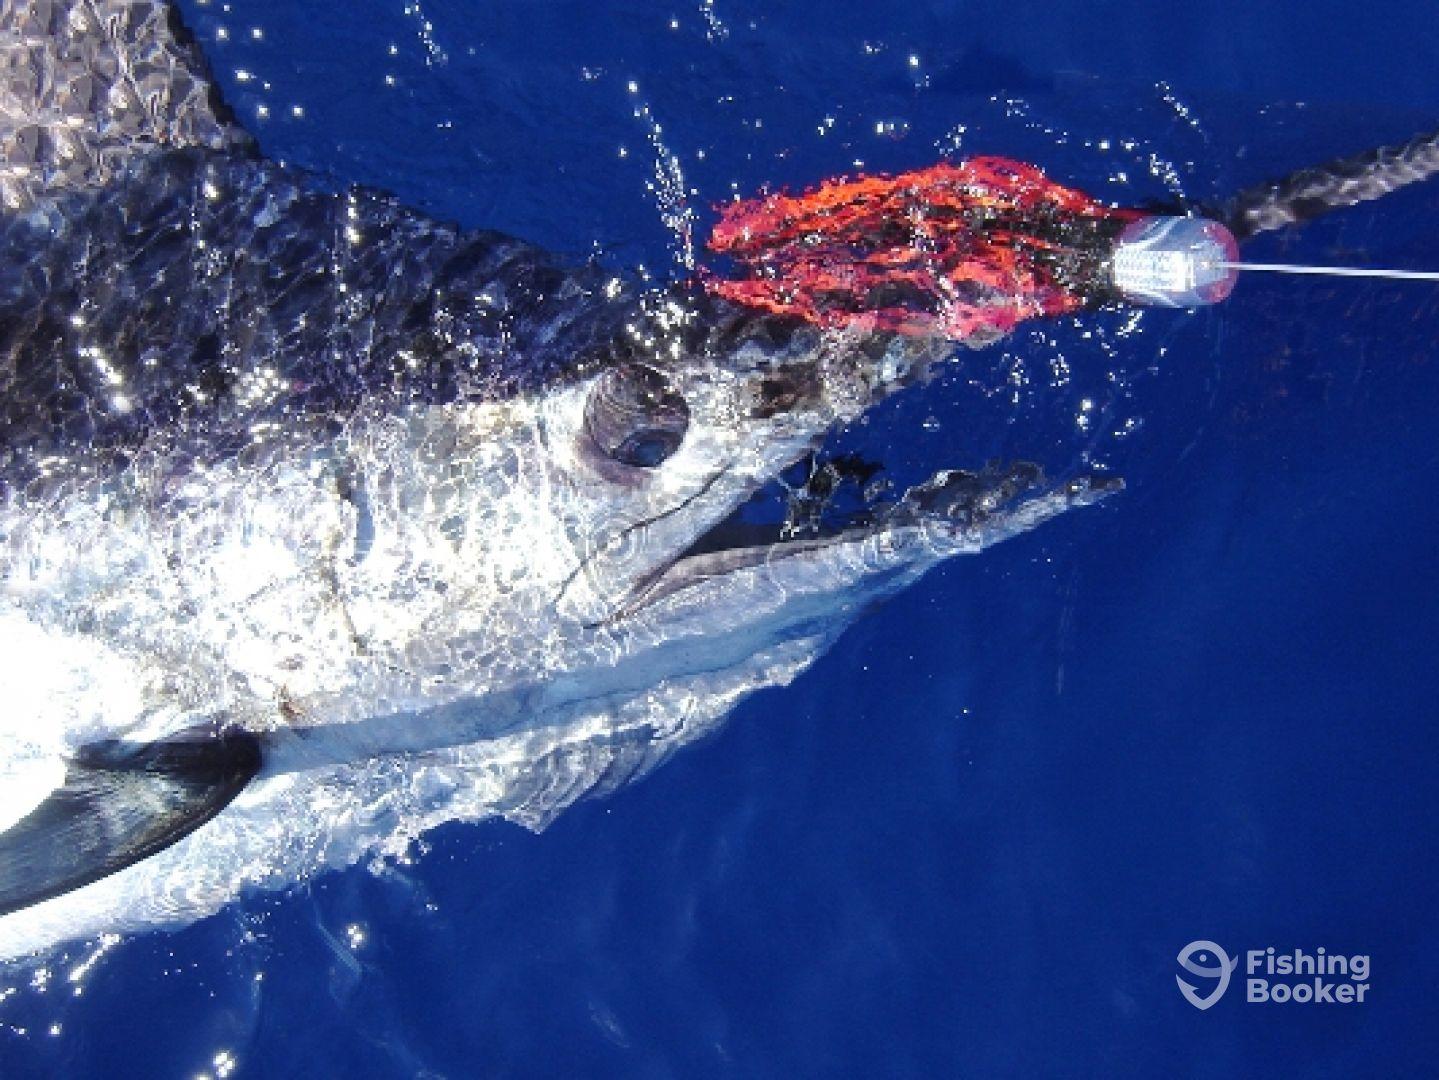 Ocean4You Offshore Fishing Charters